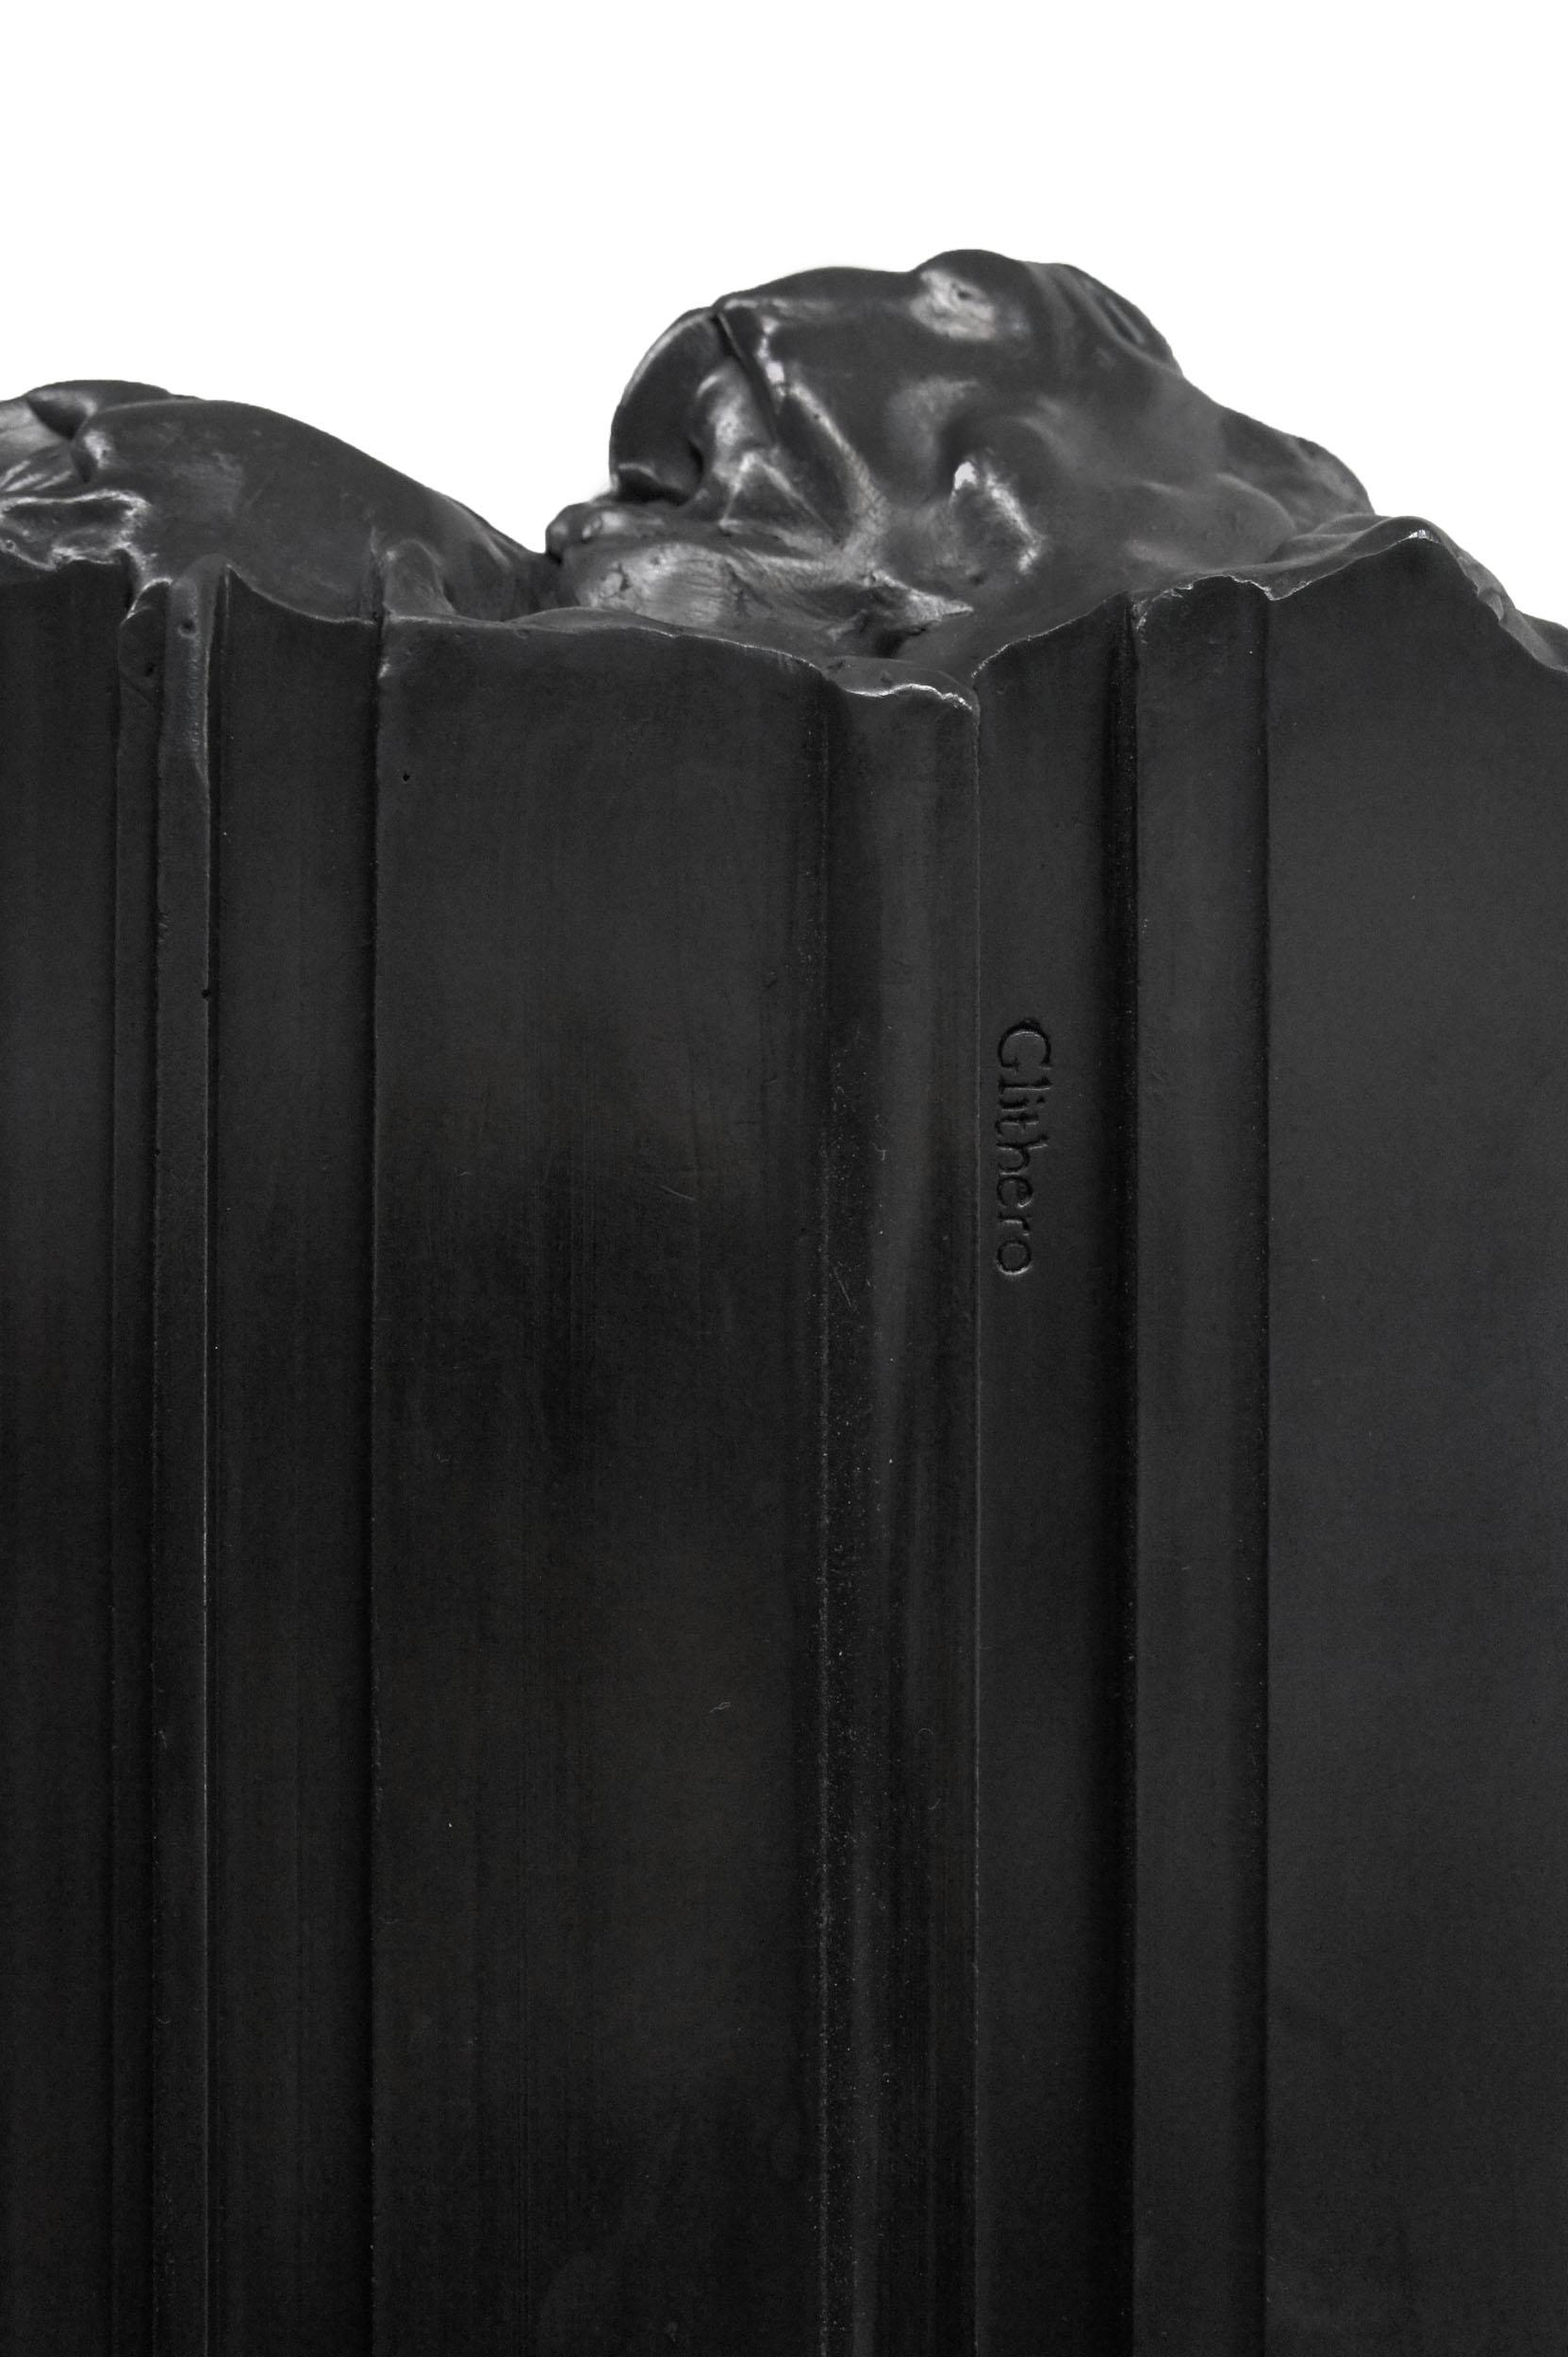 A detail of a black Bench Mould console showing spilt end